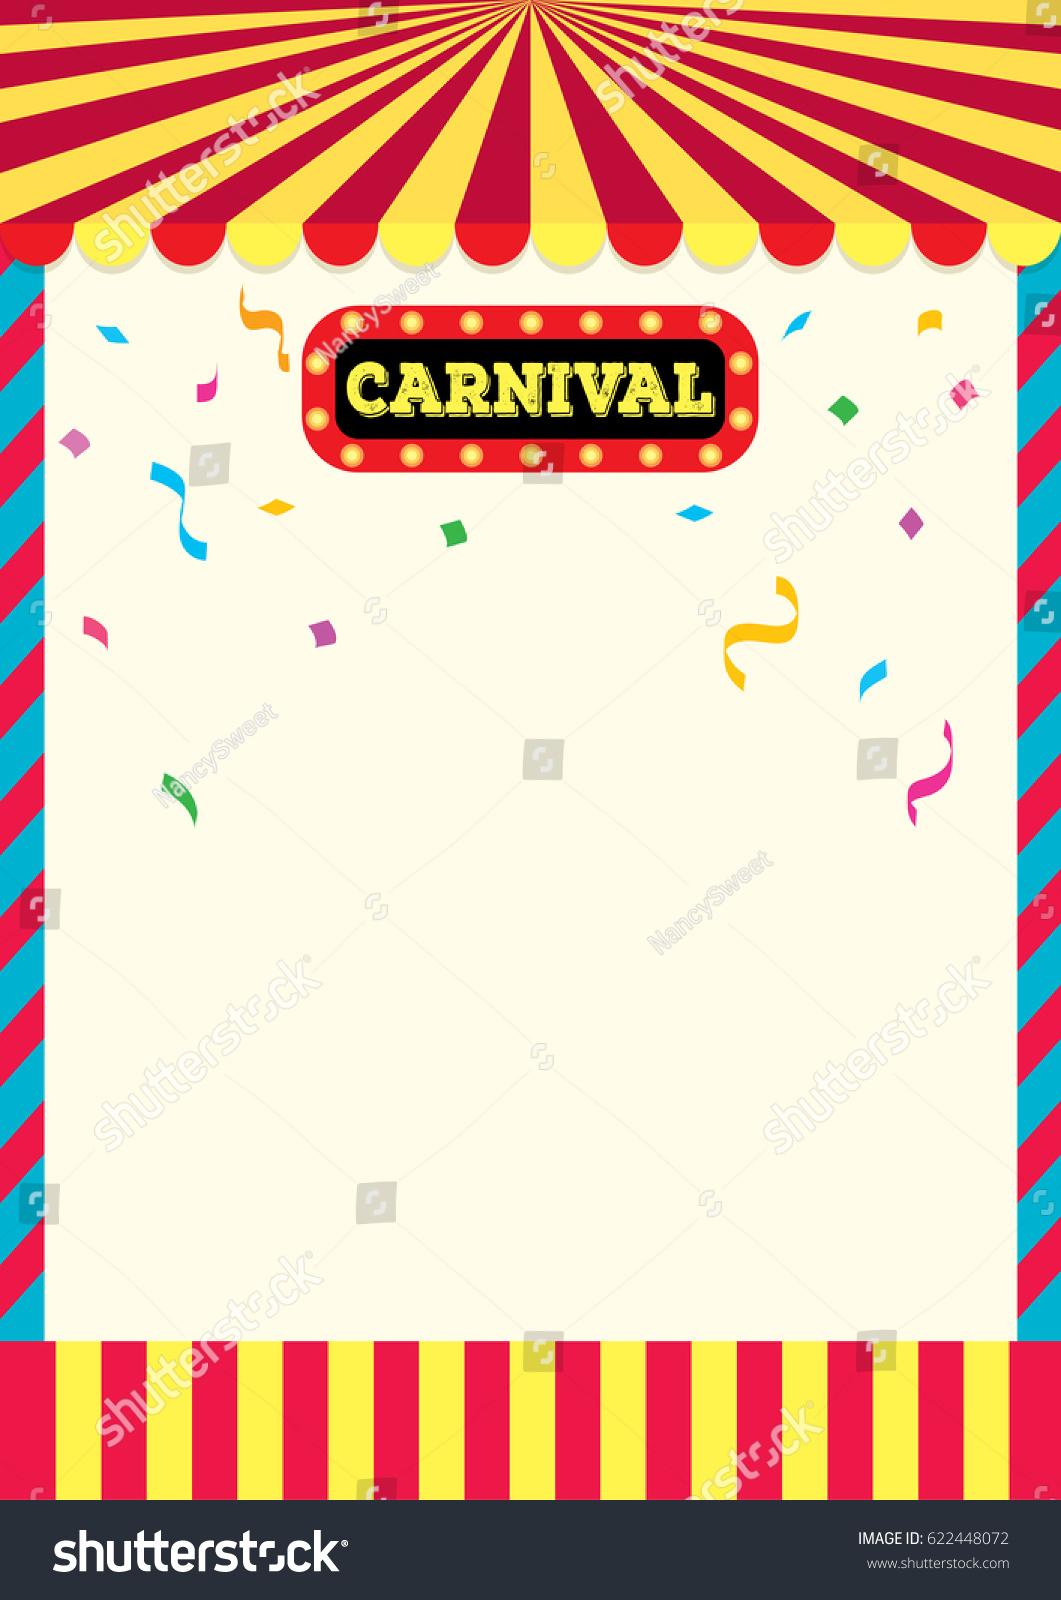 Carnival Sign Frame Design Background Template Stock Vector Royalty